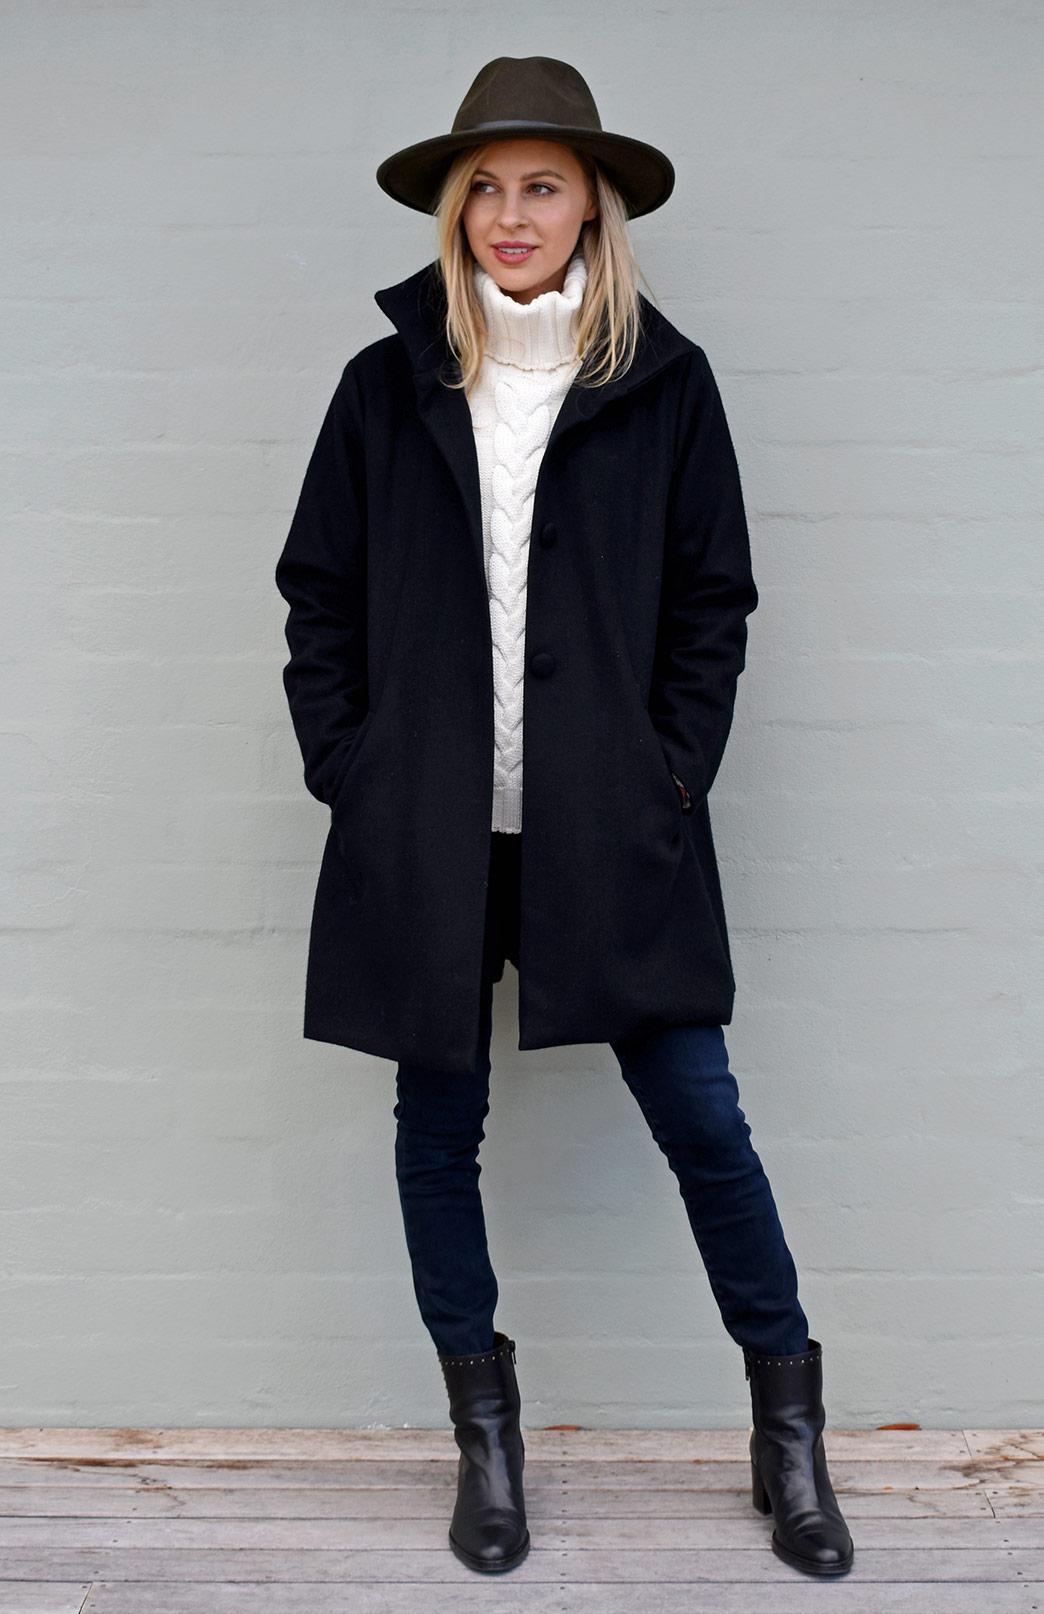 Long Coat - Black - Women's Black Superfine Merino Wool Long Winter Coat with buttons and pockets - Smitten Merino Tasmania Australia